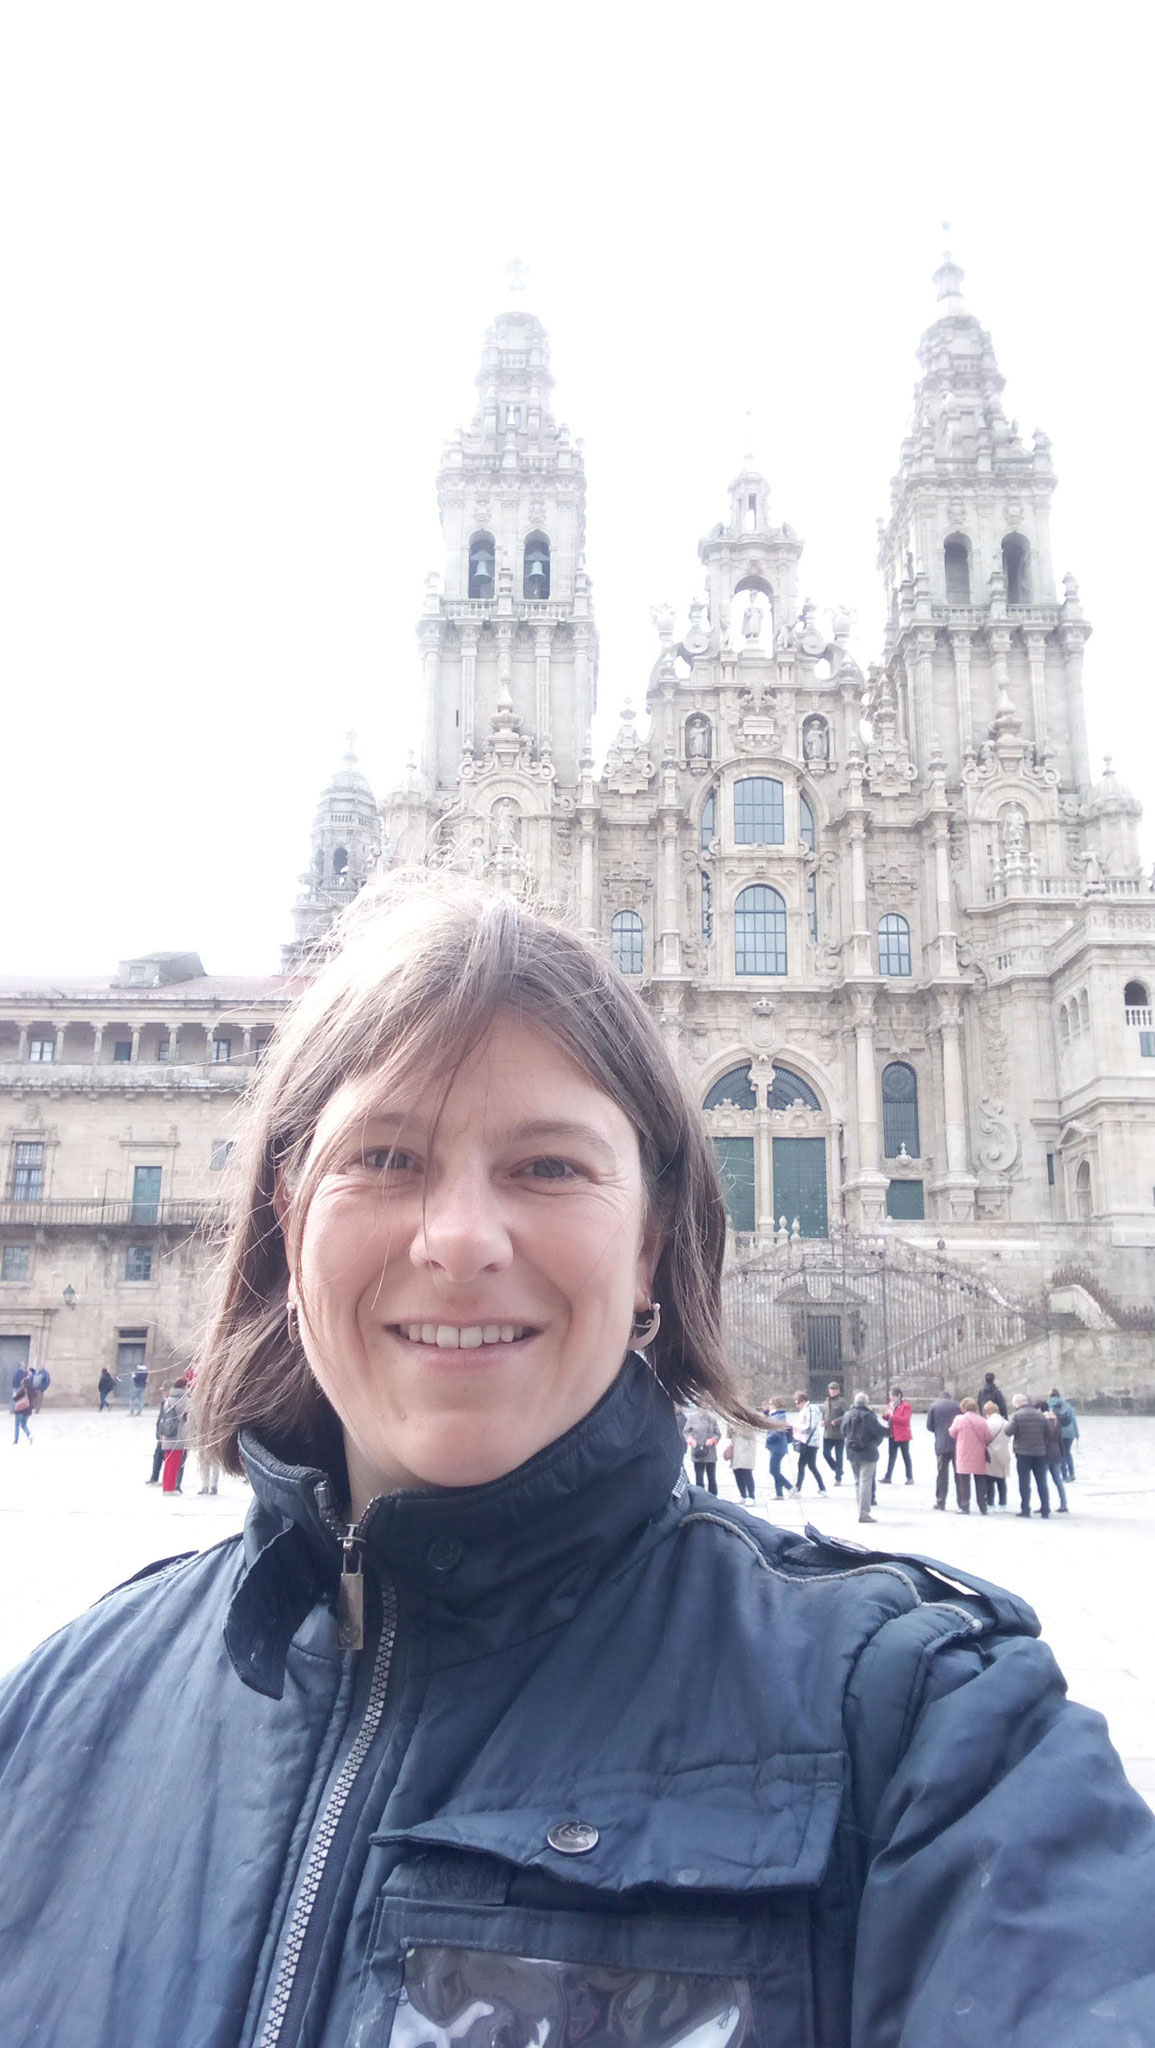 Placa do Obradoiro: Cathedrale Santiago de Compostela